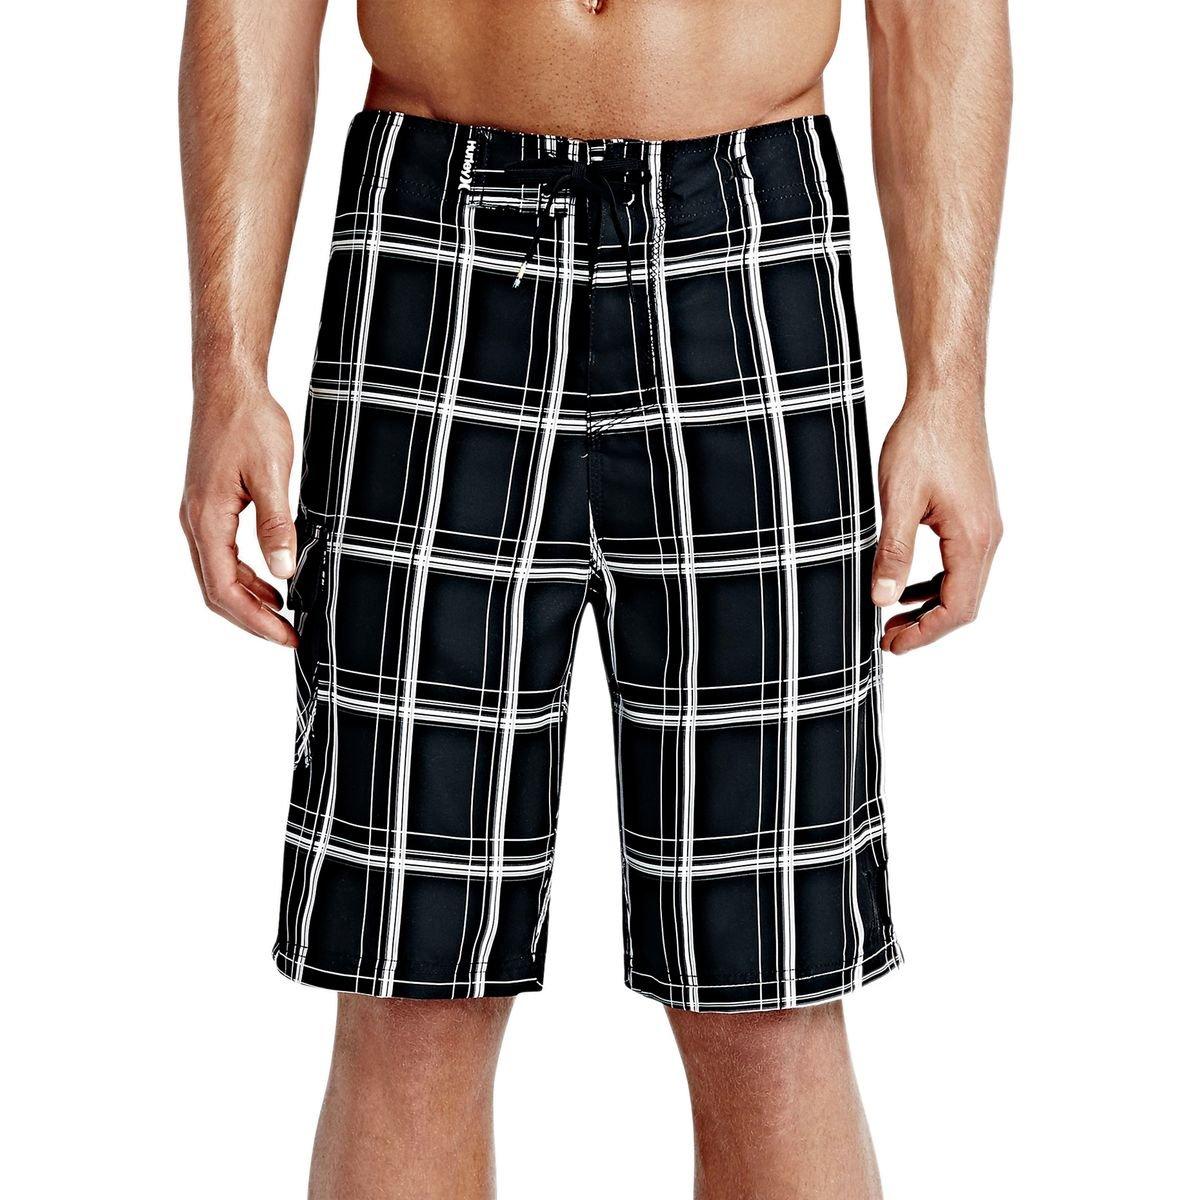 Hurley Men's Puerto Rico Burnout 19'' Boardshorts Black Board Shorts 36